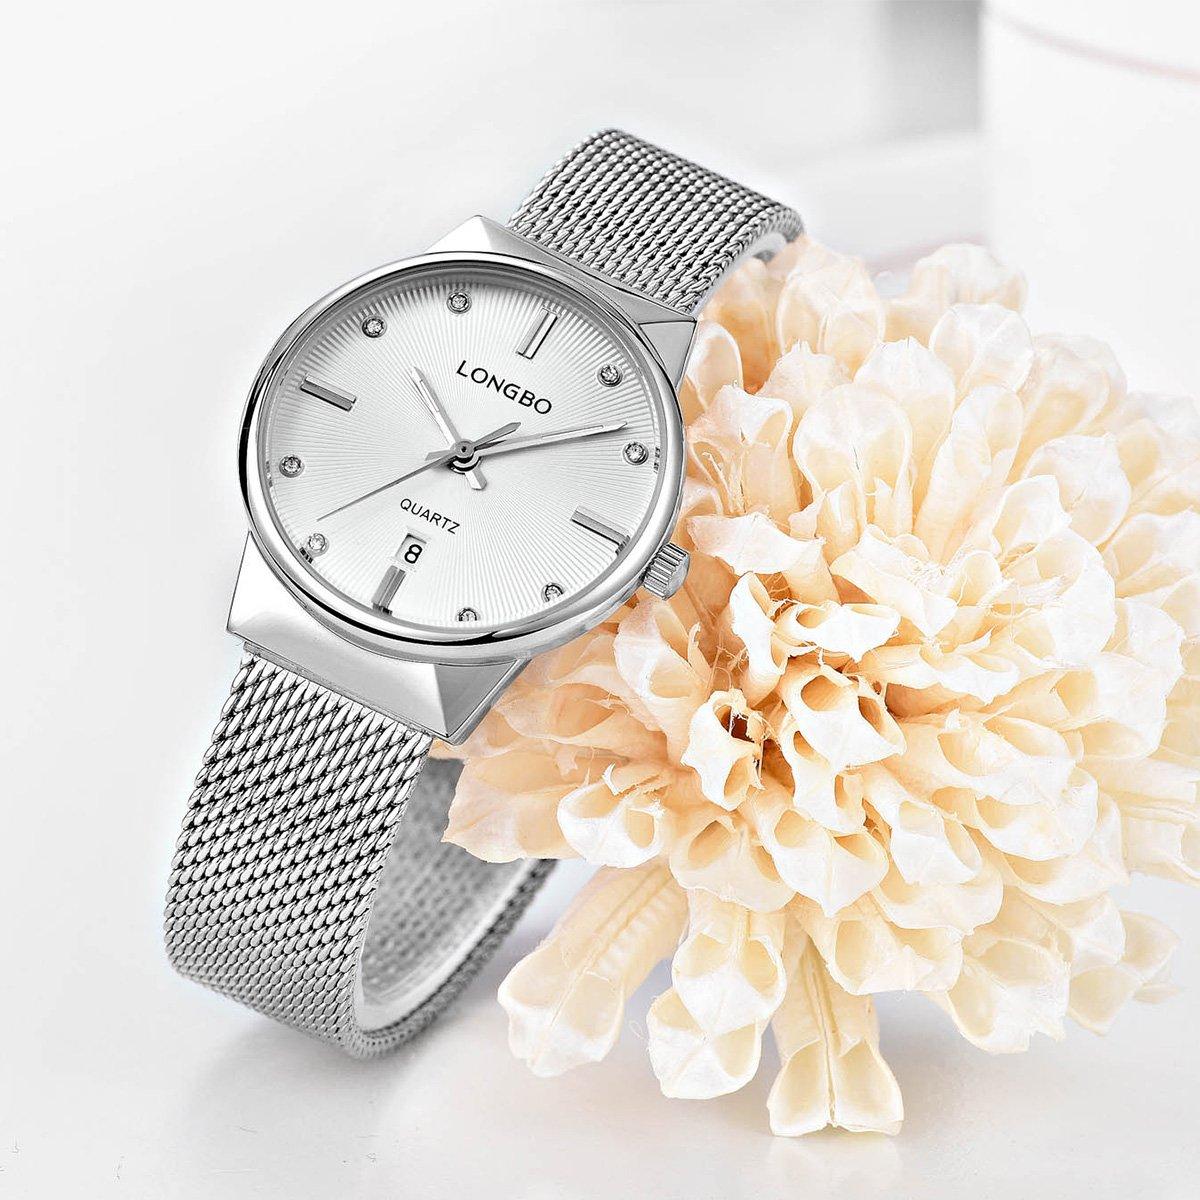 Amazon.com: LONGBO Luxury Womens Silver Metal Mesh Strap Analog Quartz Business Watch Auto Date Calendar Couple Dress Watch Waterproof Rhinestone Accented ...